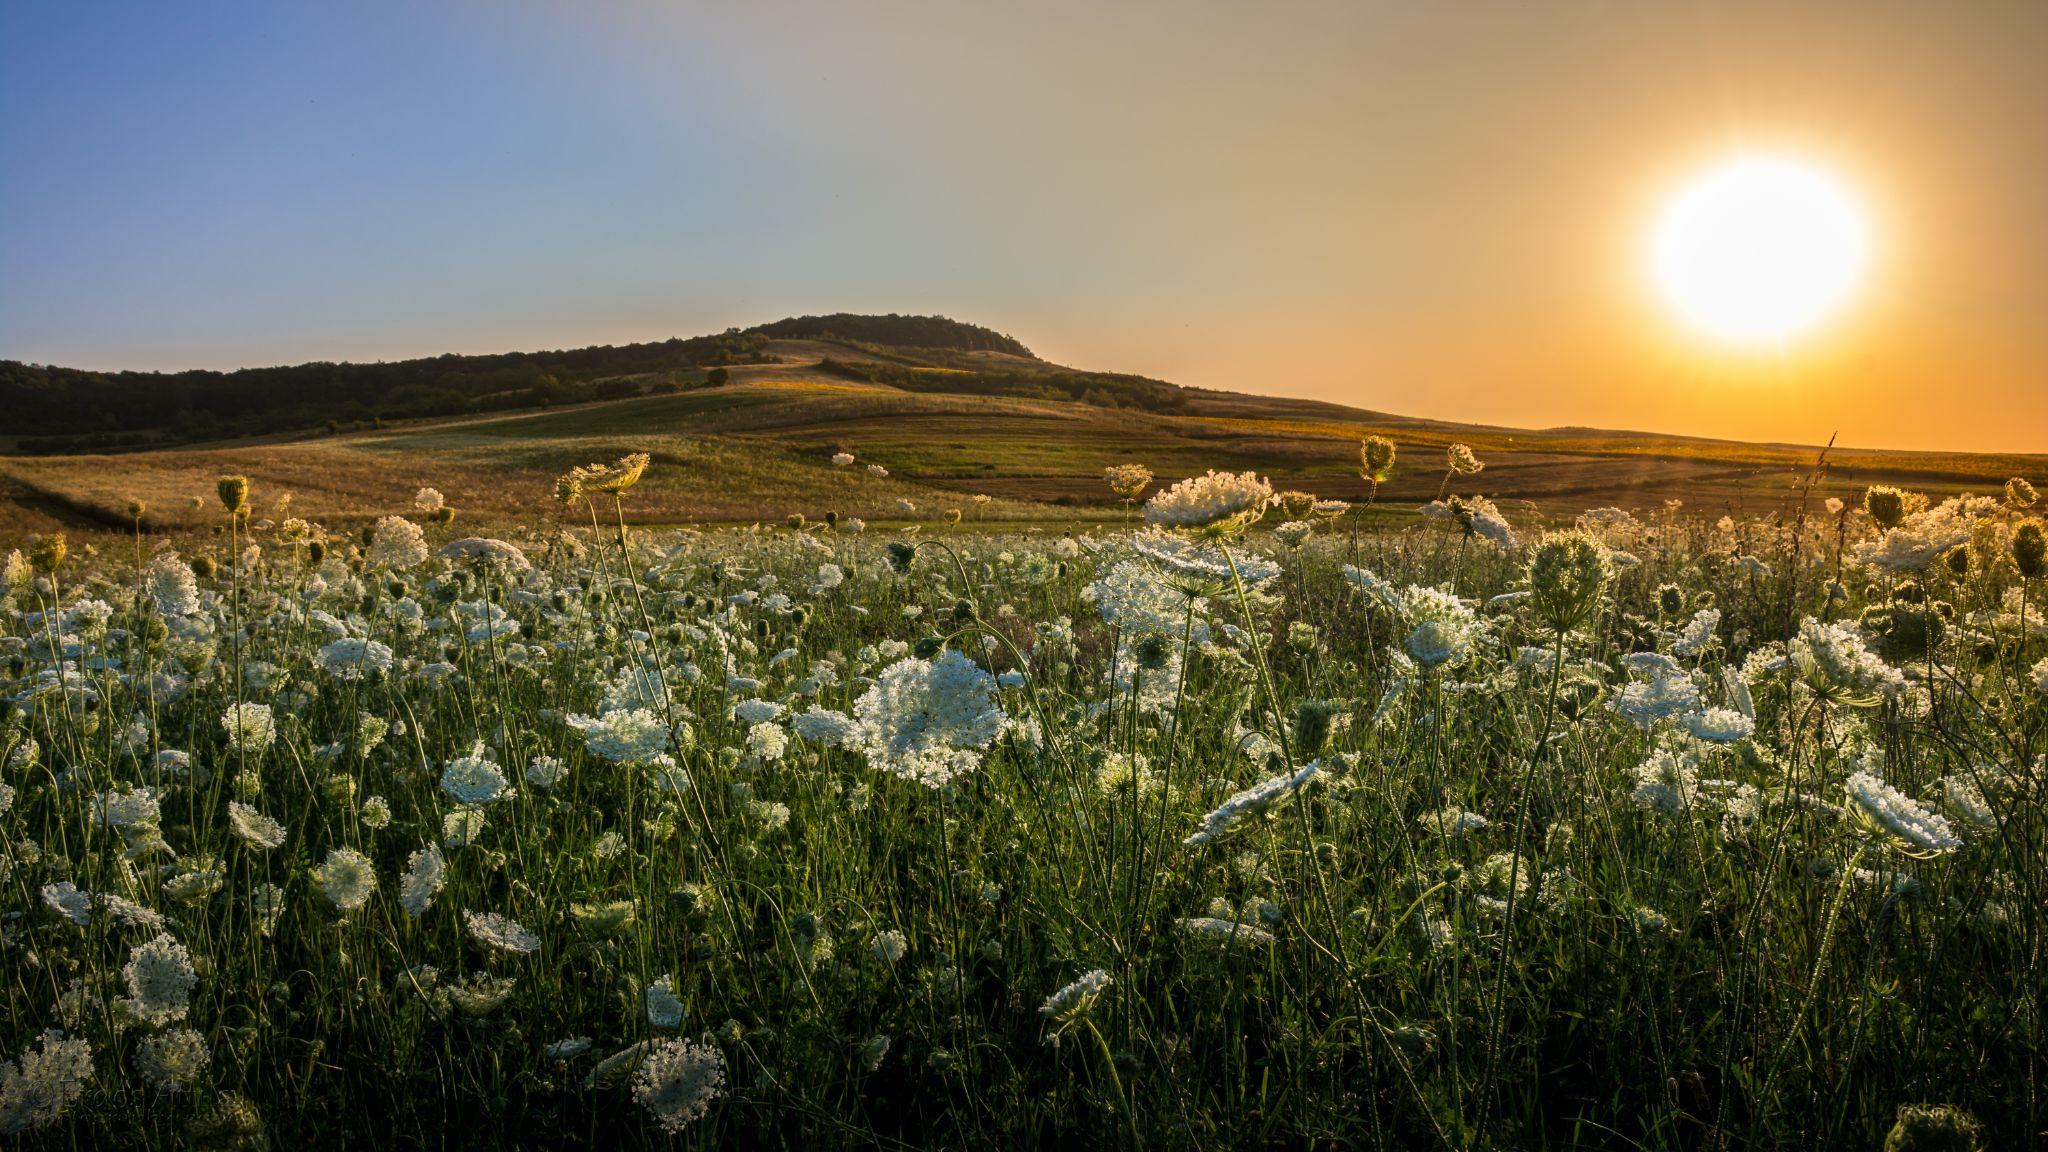 Before The Sun Sets by rdsattila